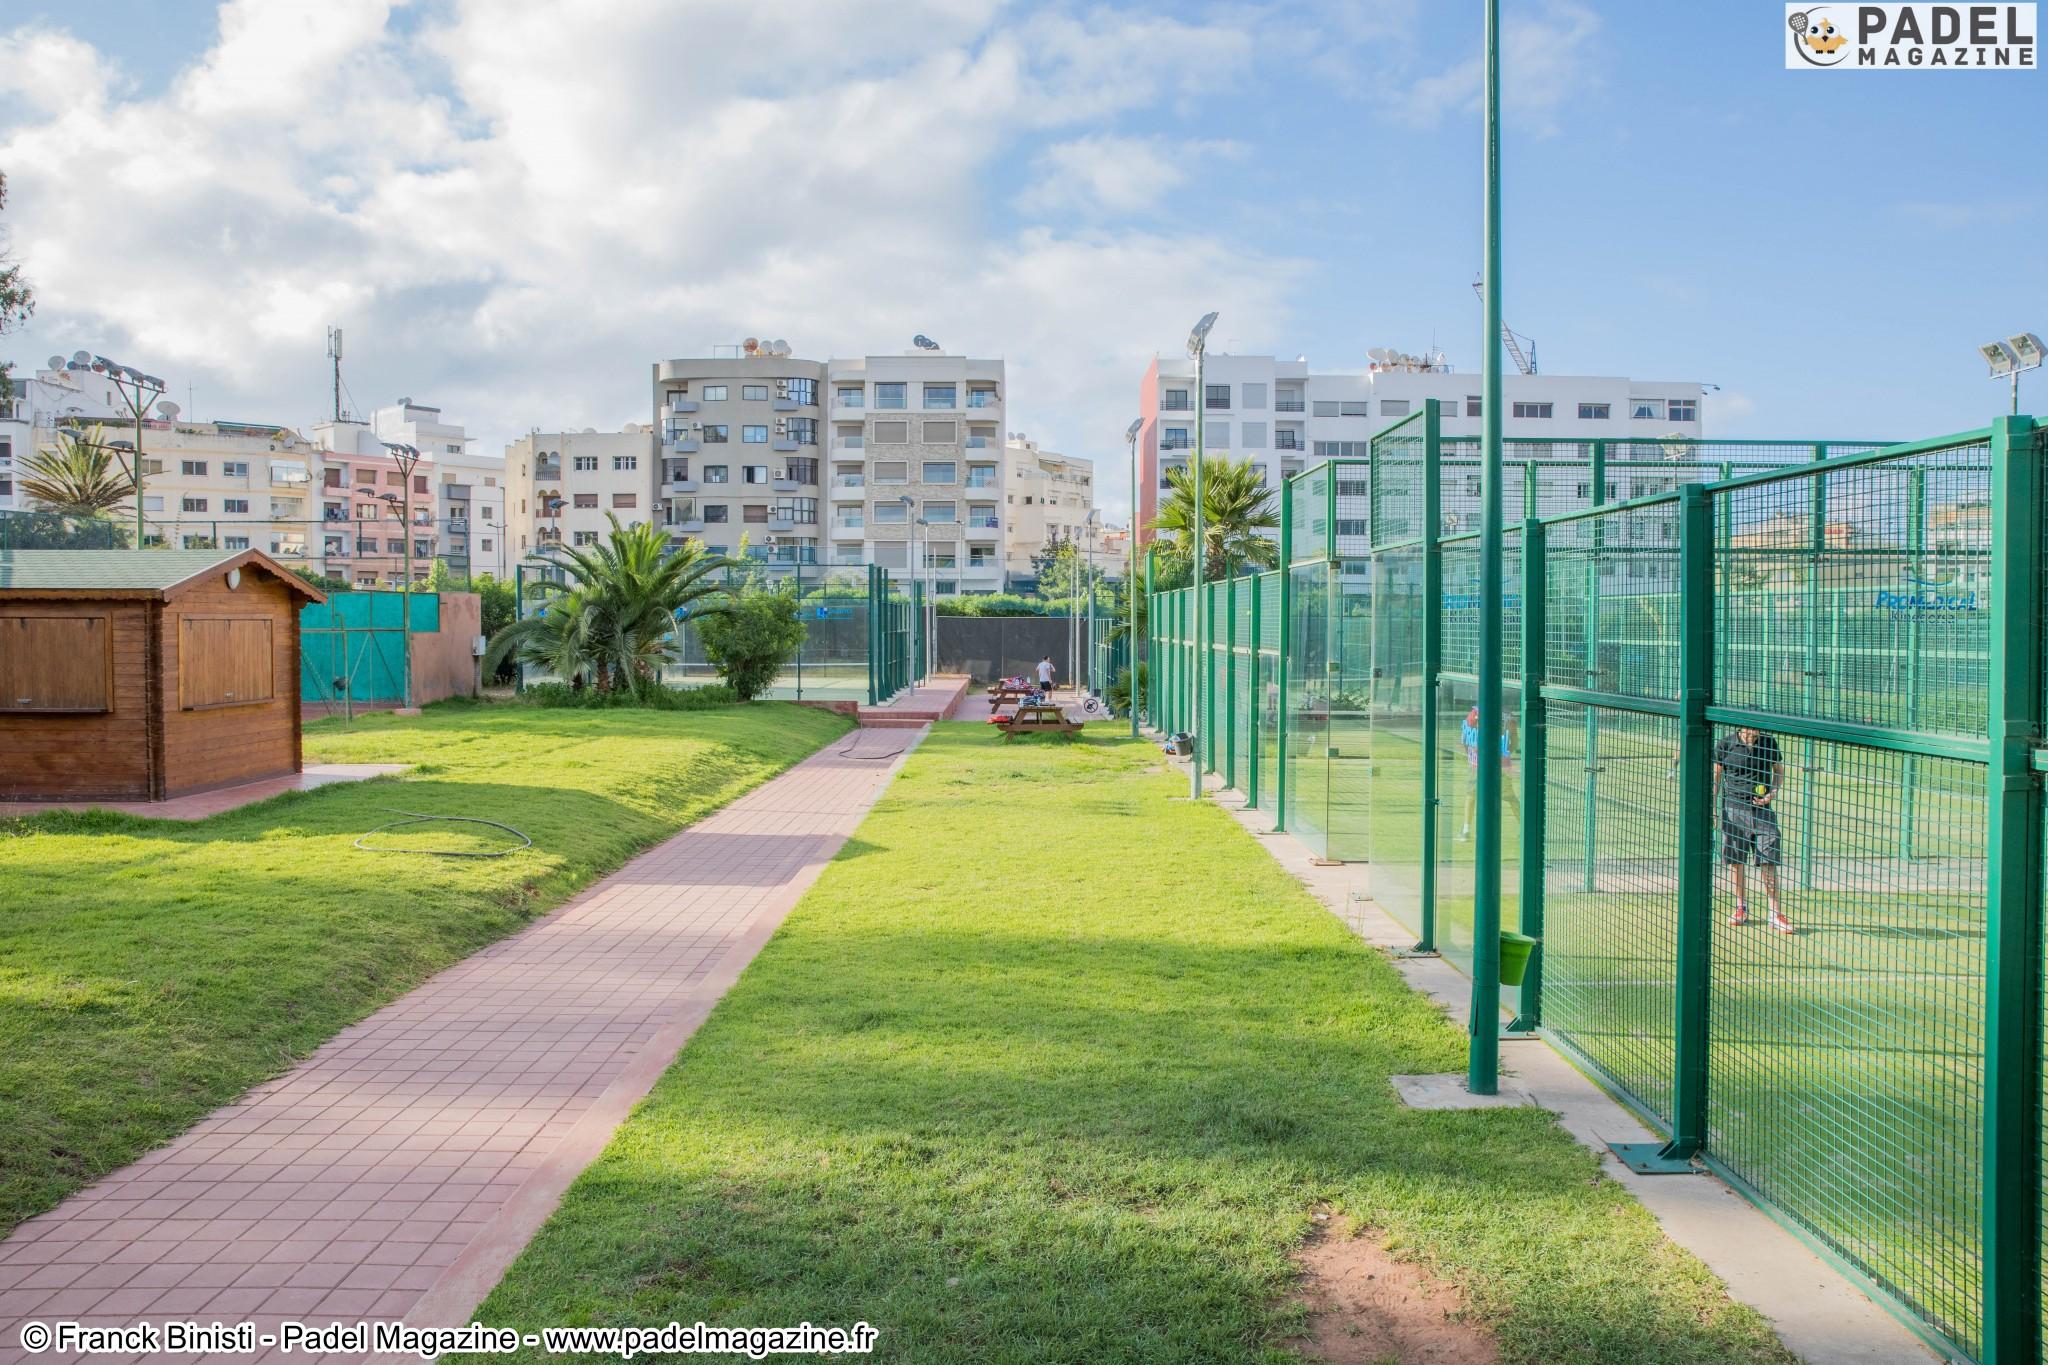 CAFC – Bastion du padel marocain